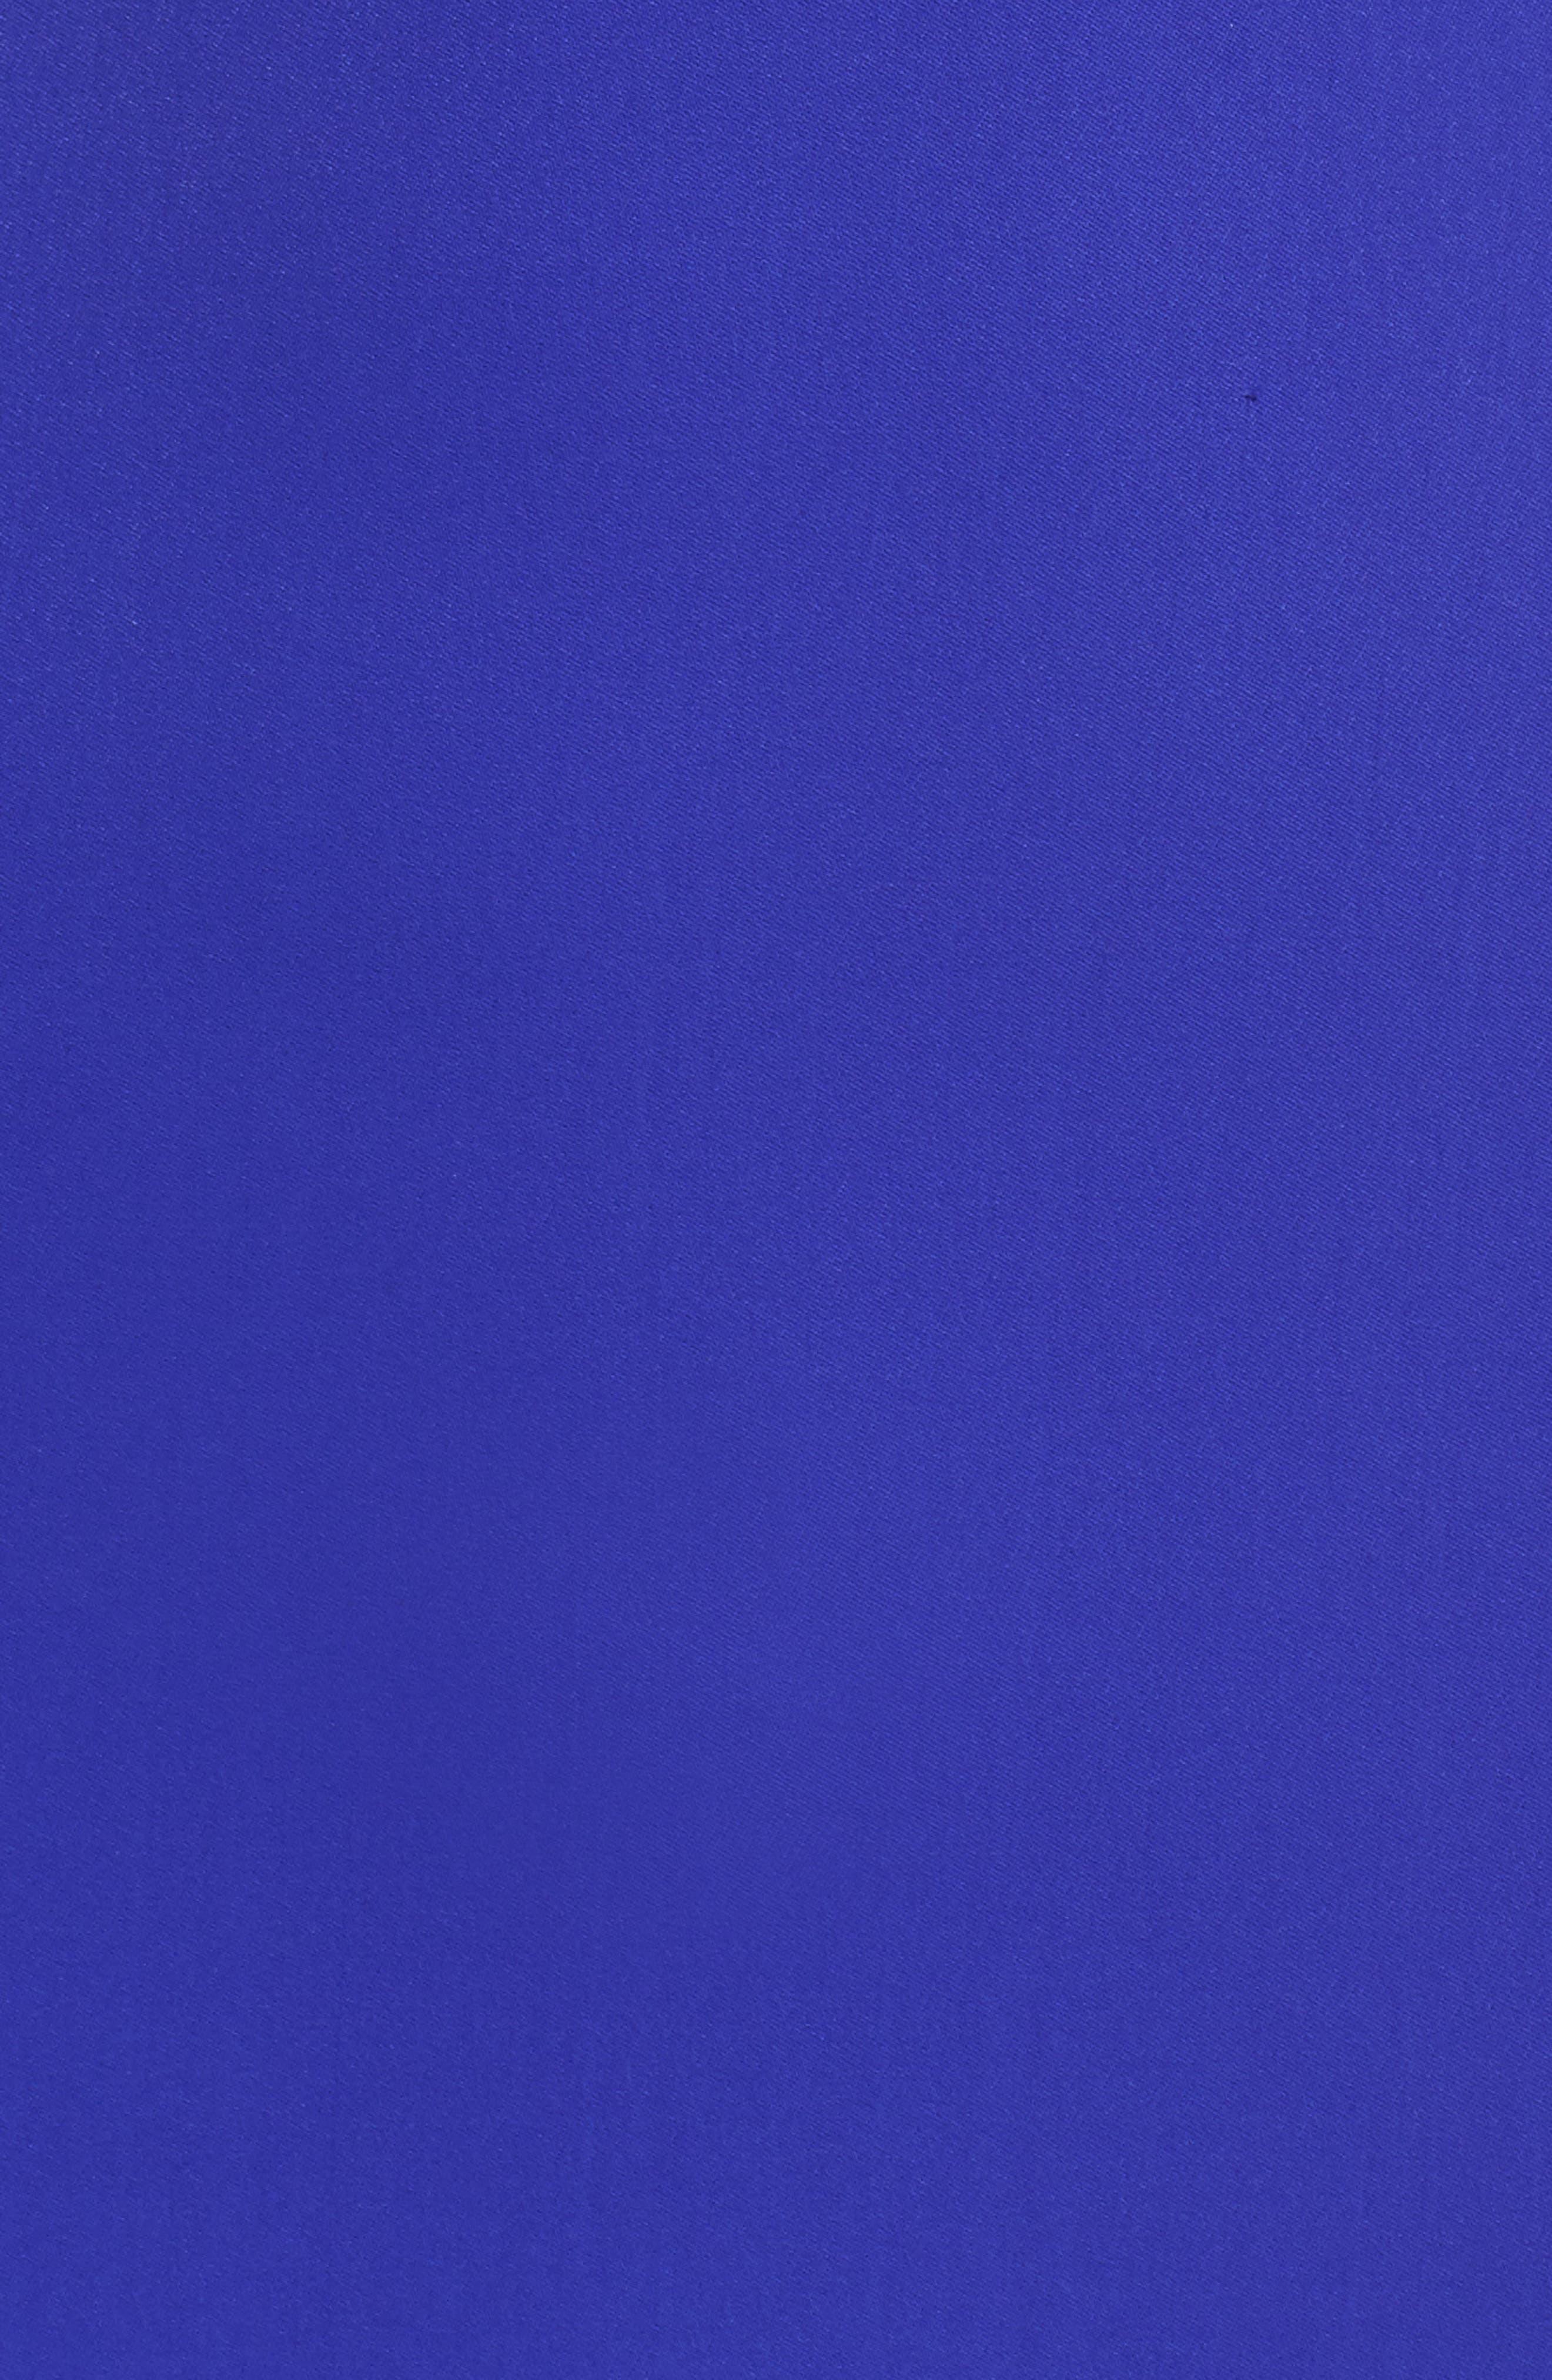 Off-the-Shoulder Lace & Crepe Gown,                             Alternate thumbnail 5, color,                             Royal Iris